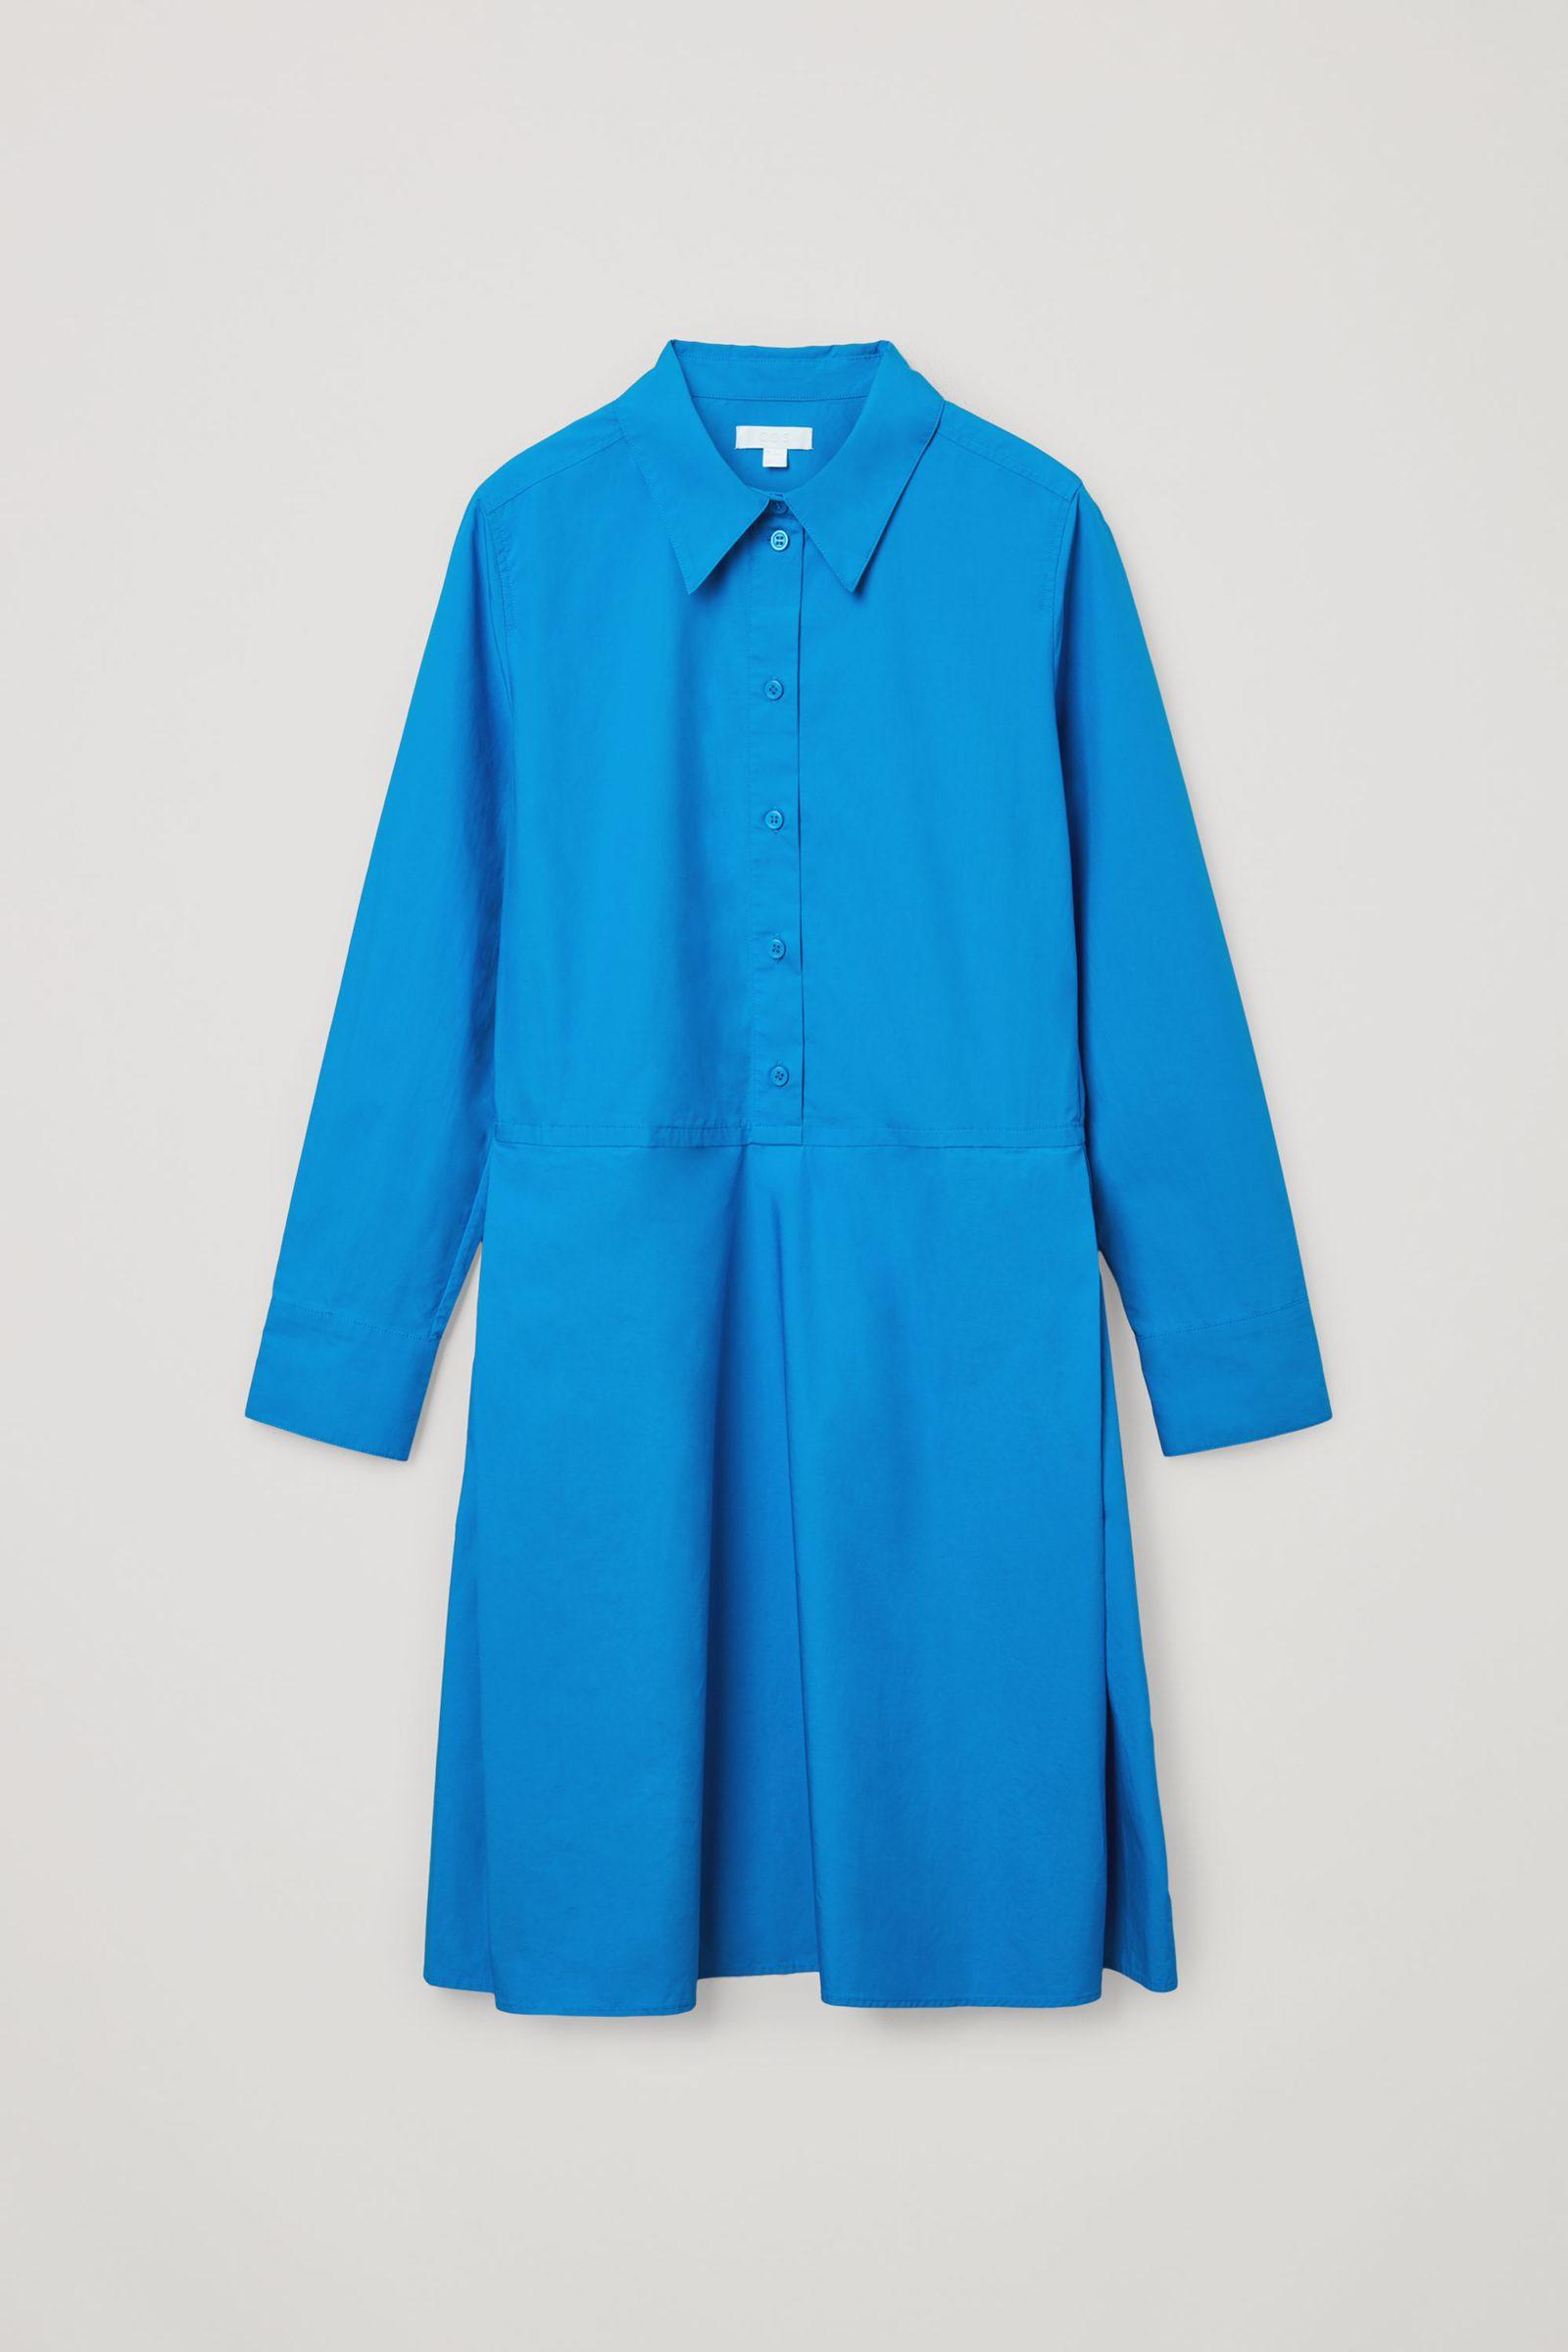 COS 플리츠 코튼 셔츠 드레스의 블루컬러 Product입니다.